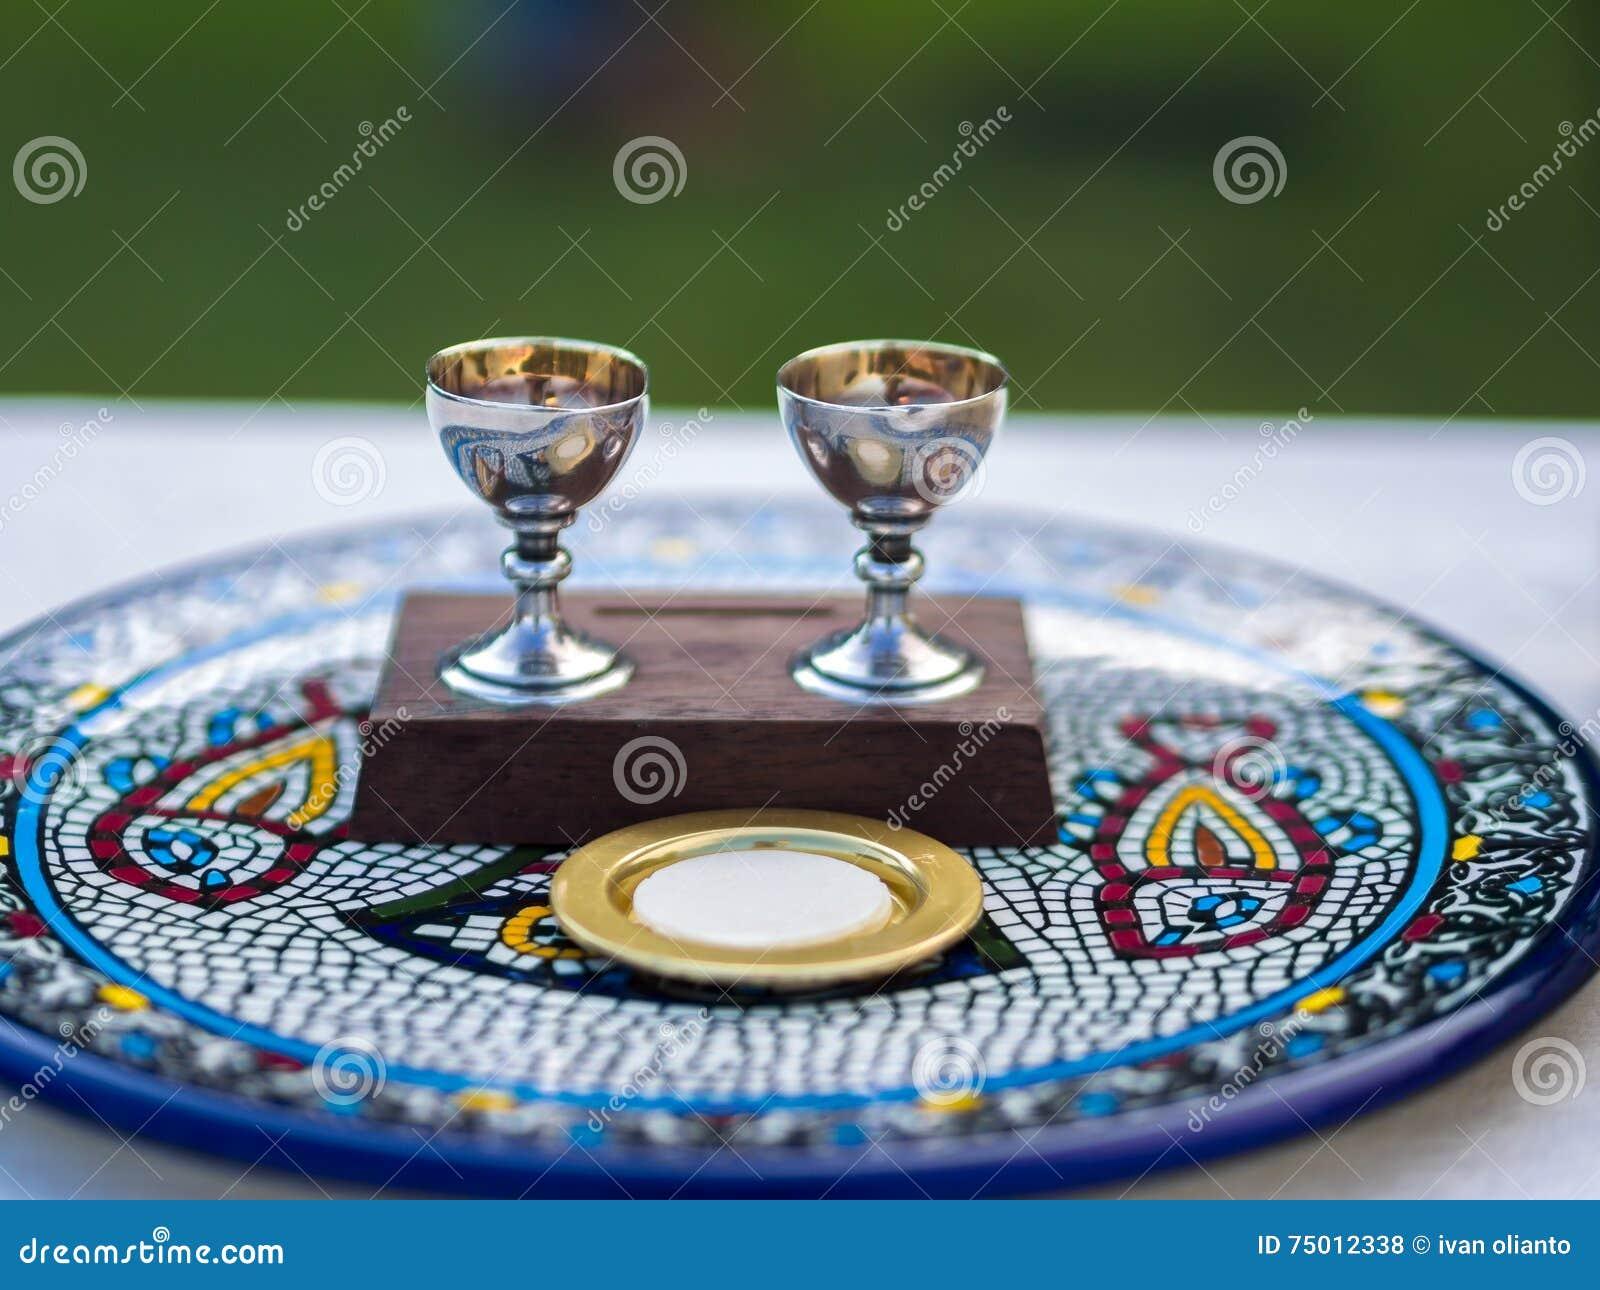 Wine and Host (Sacramental Bread) on Ceramic Plate